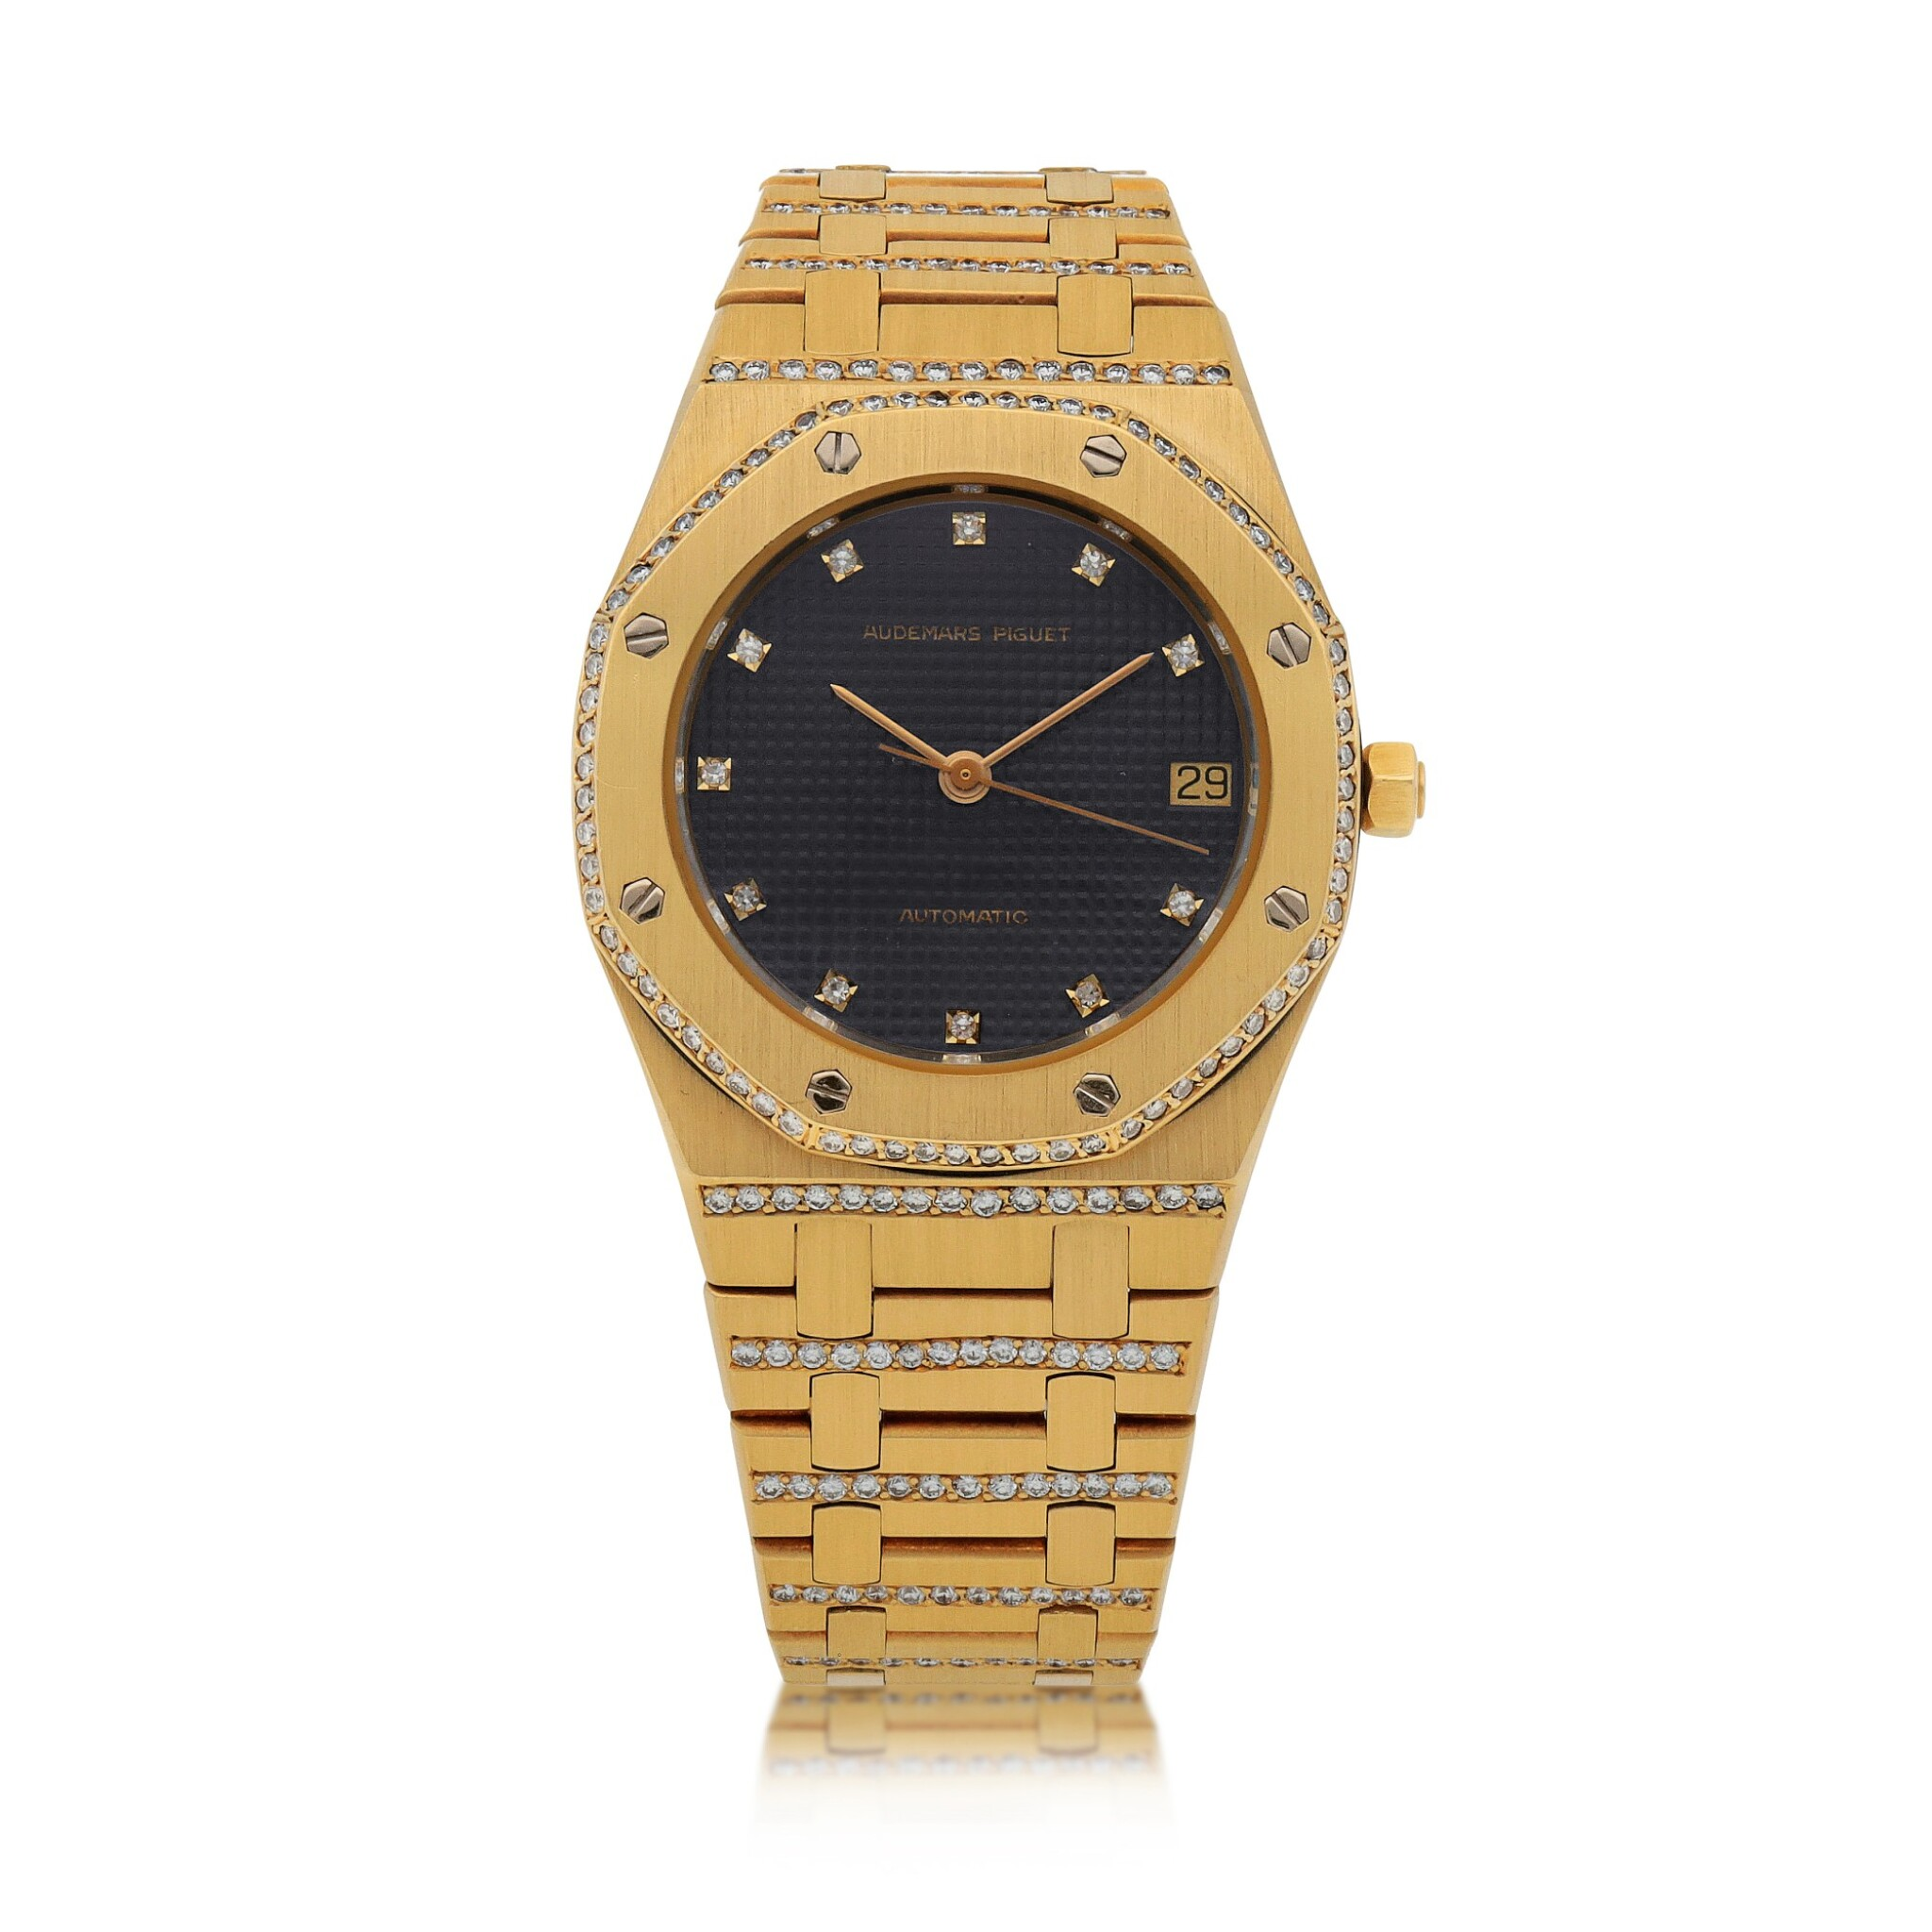 View full screen - View 1 of Lot 519. Royal Oak Yellow gold and diamond-set wristwatch with date and bracelet Circa 1985 | 愛彼 「Royal Oak」黃金鑲鑽石鍊帶腕錶備日期顯示,年份約1985.